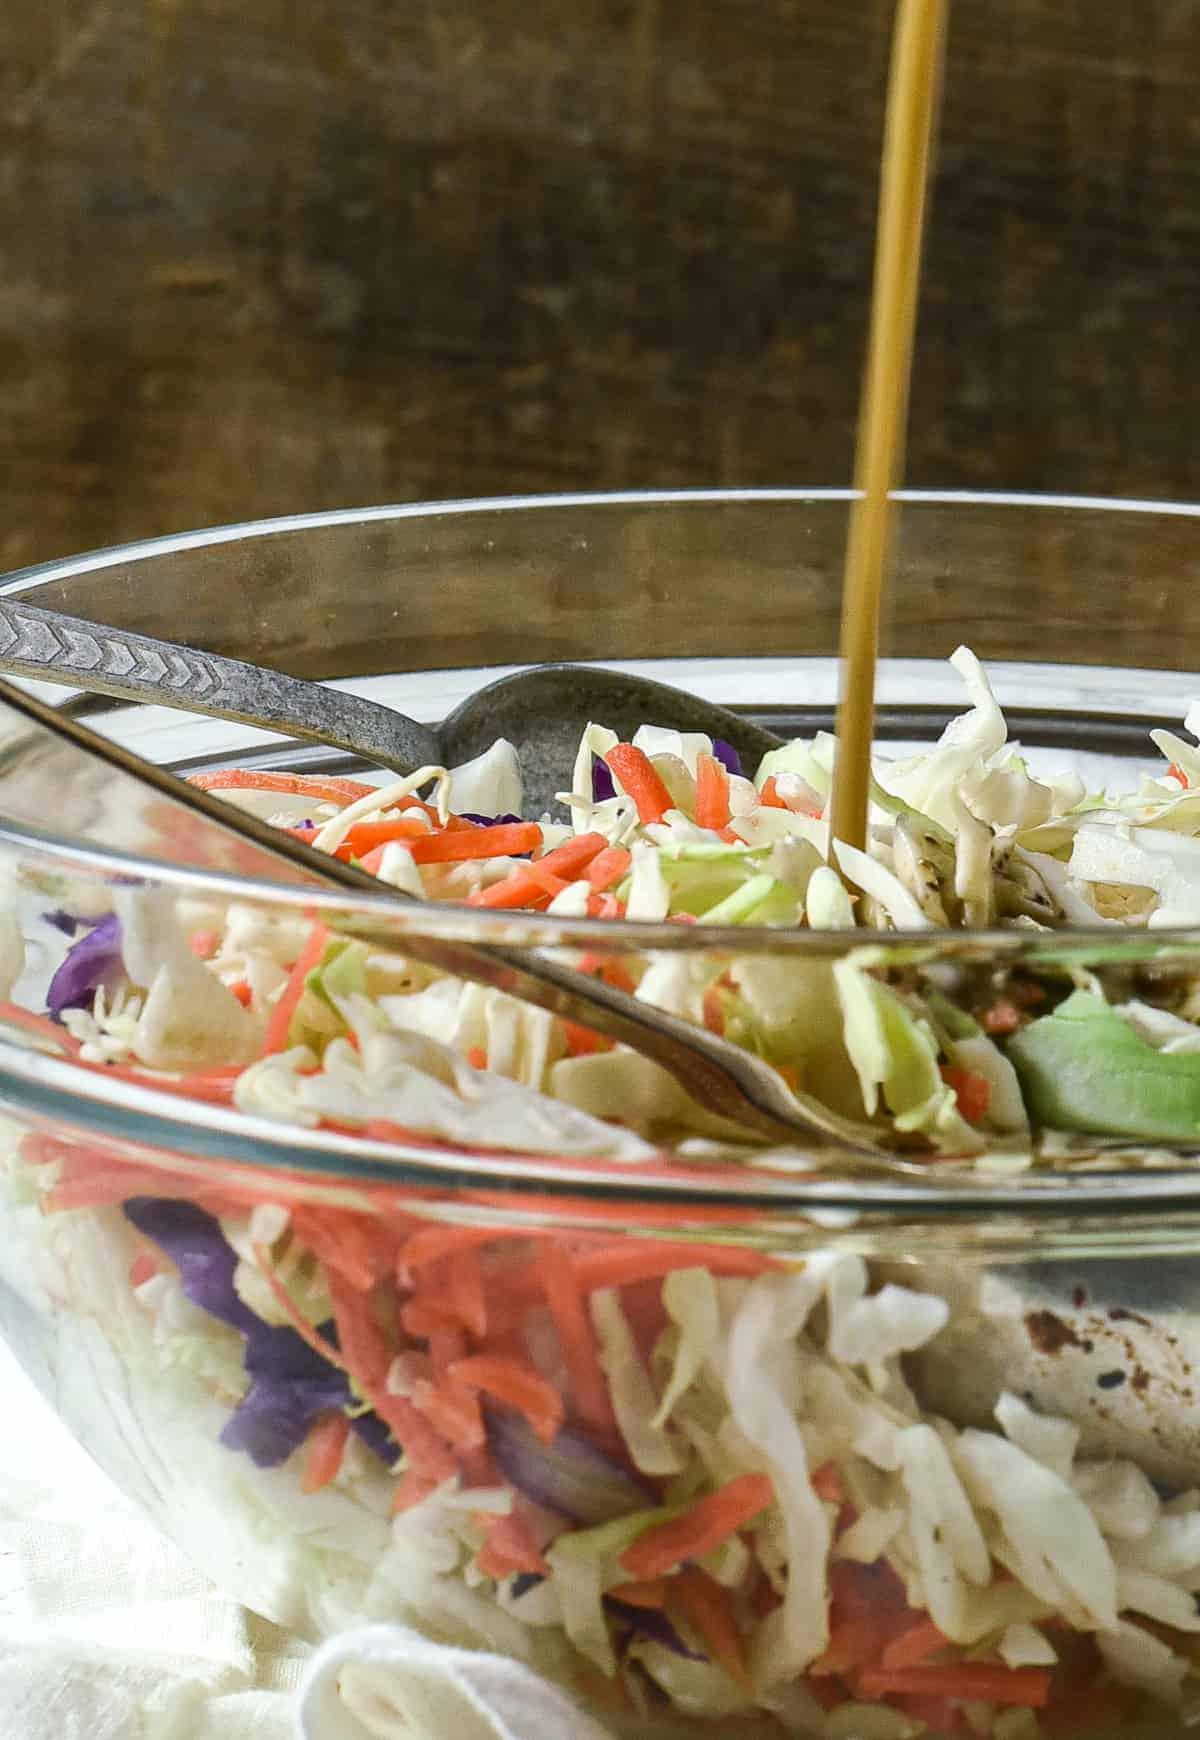 Dressing poured onto salad.